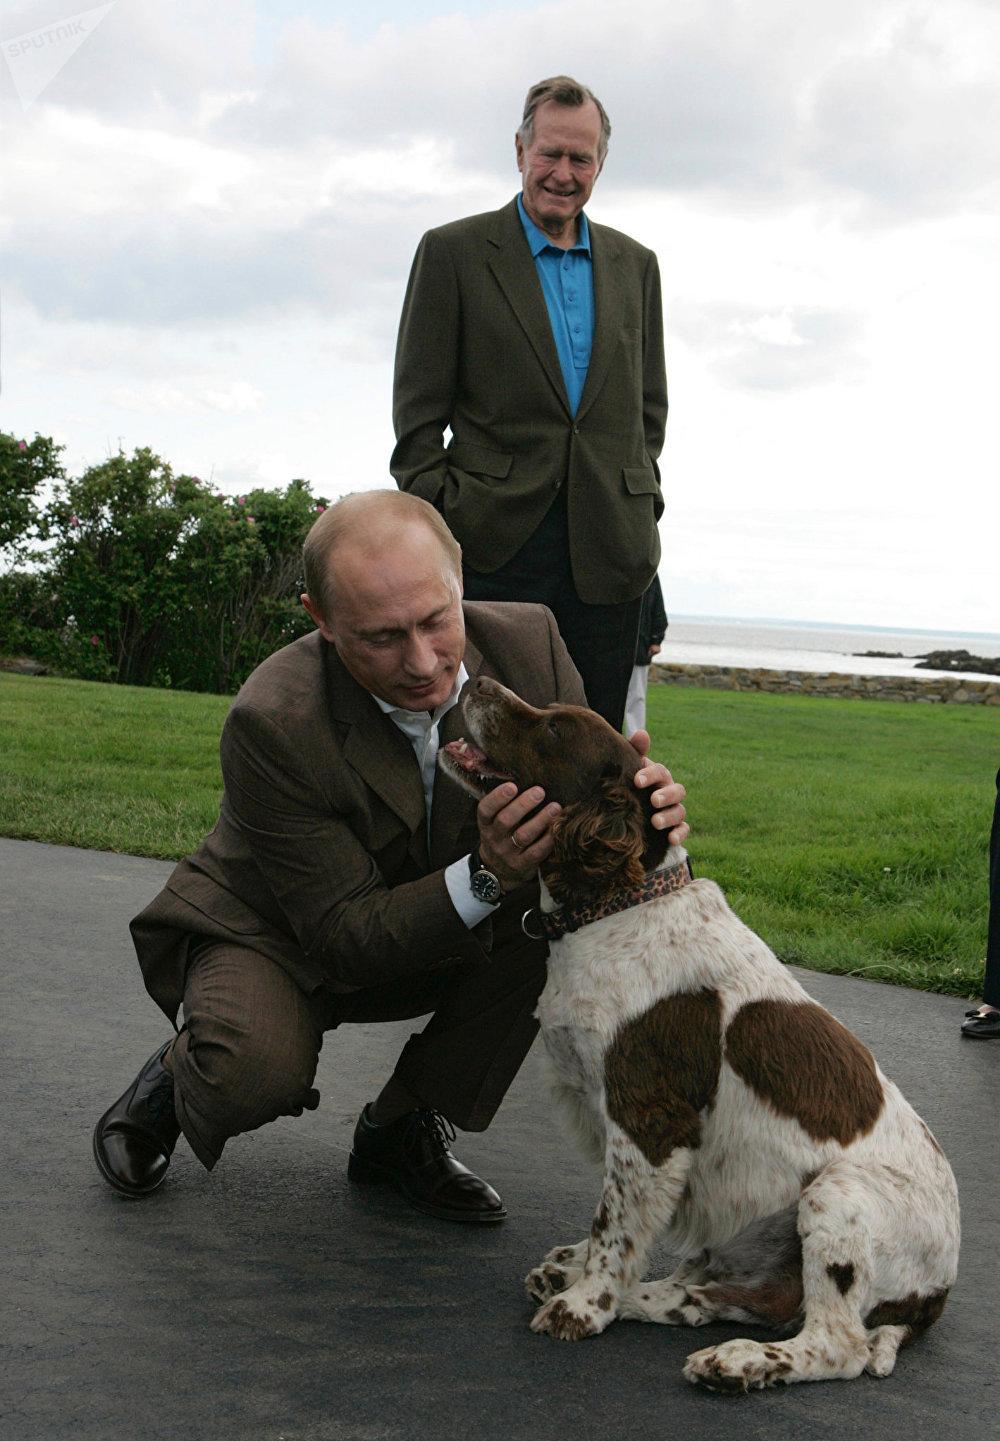 جورج بوش وفلاديمير بوتين